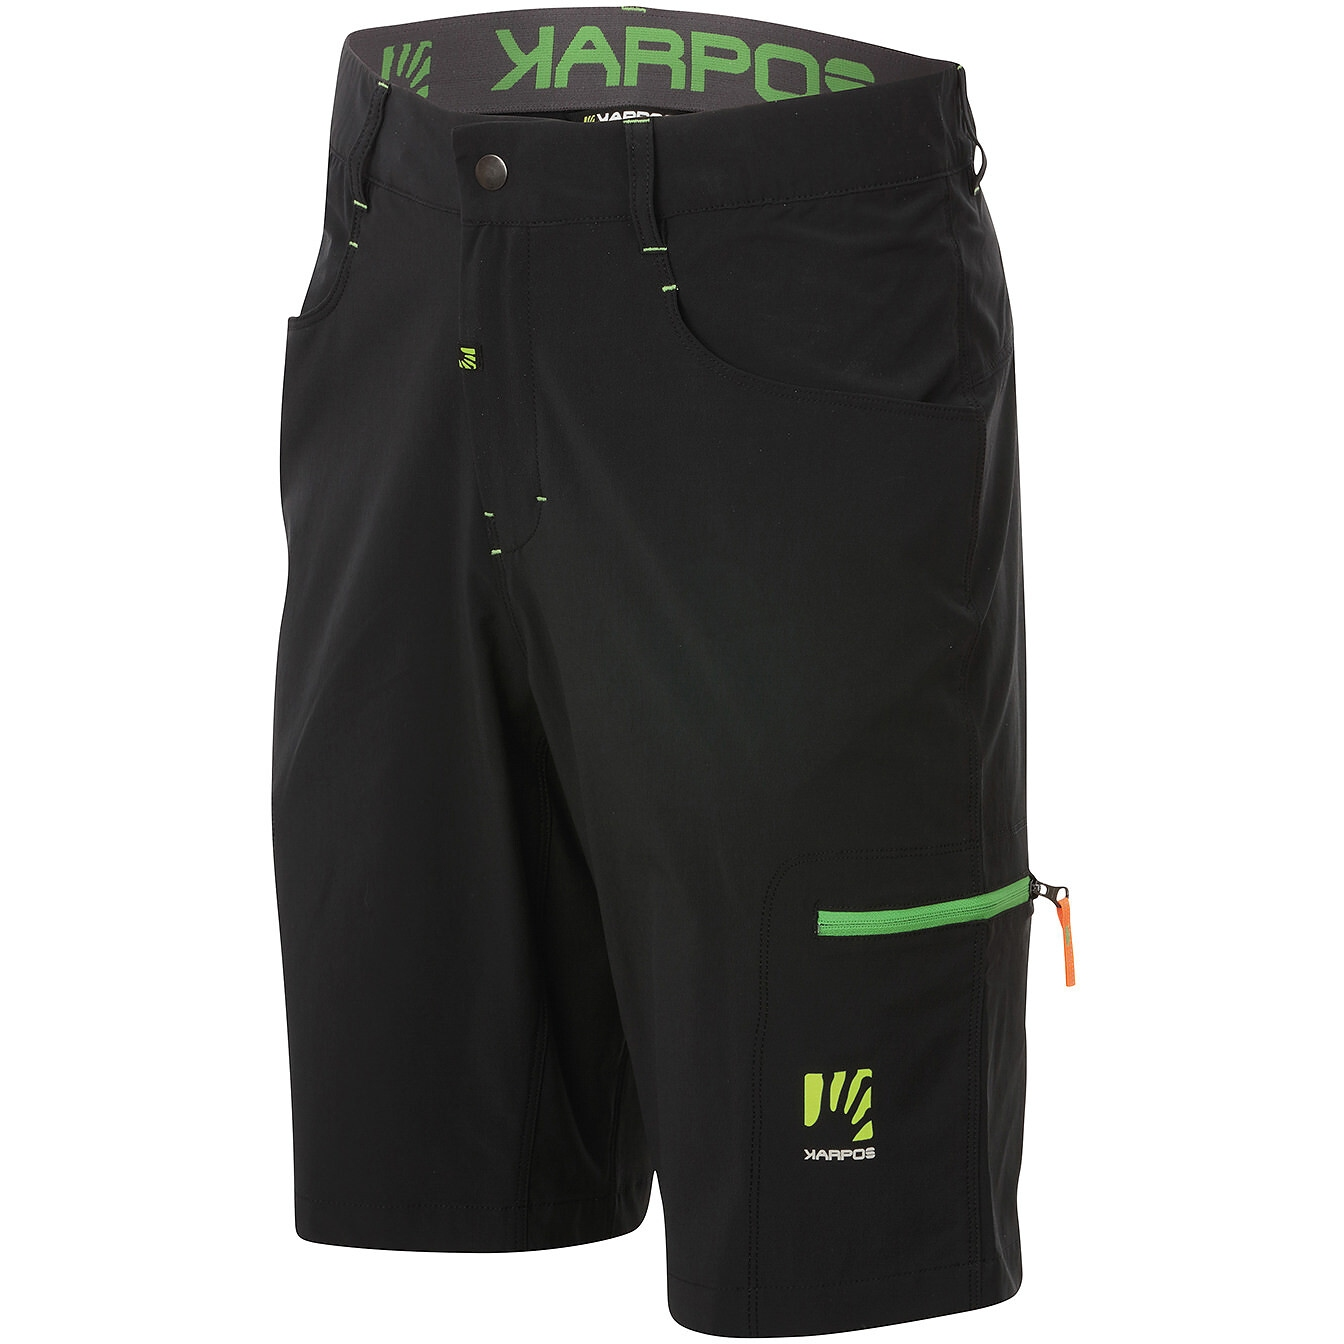 Karpos Fantasia Bermuda Shorts - black